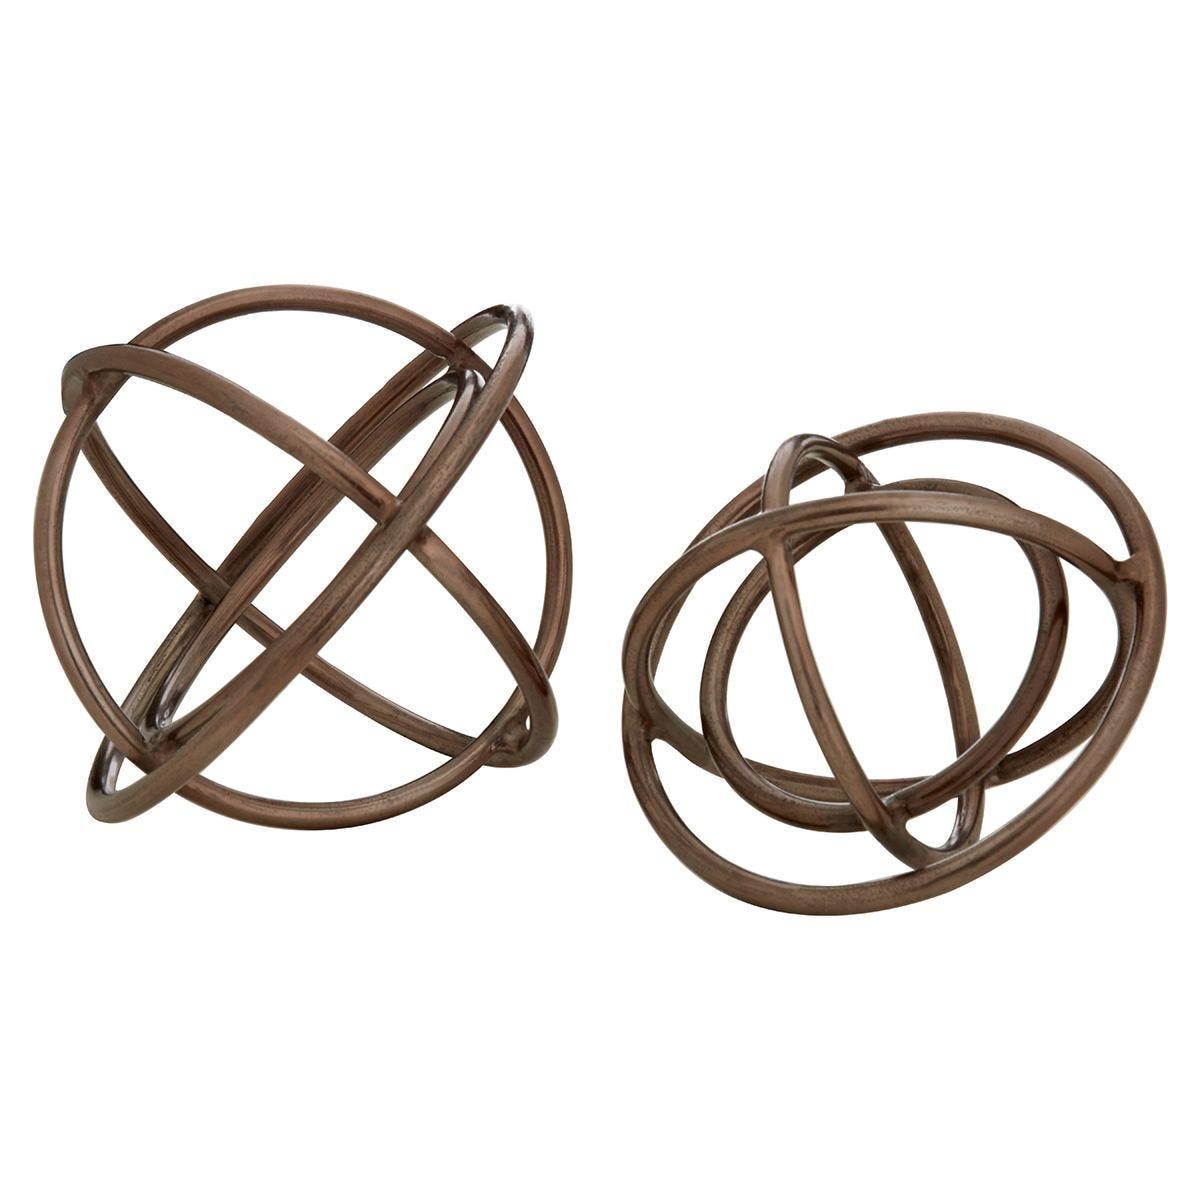 Premier Housewares Nexus  Set of 2 Sculptures - Rough Bronze Finish